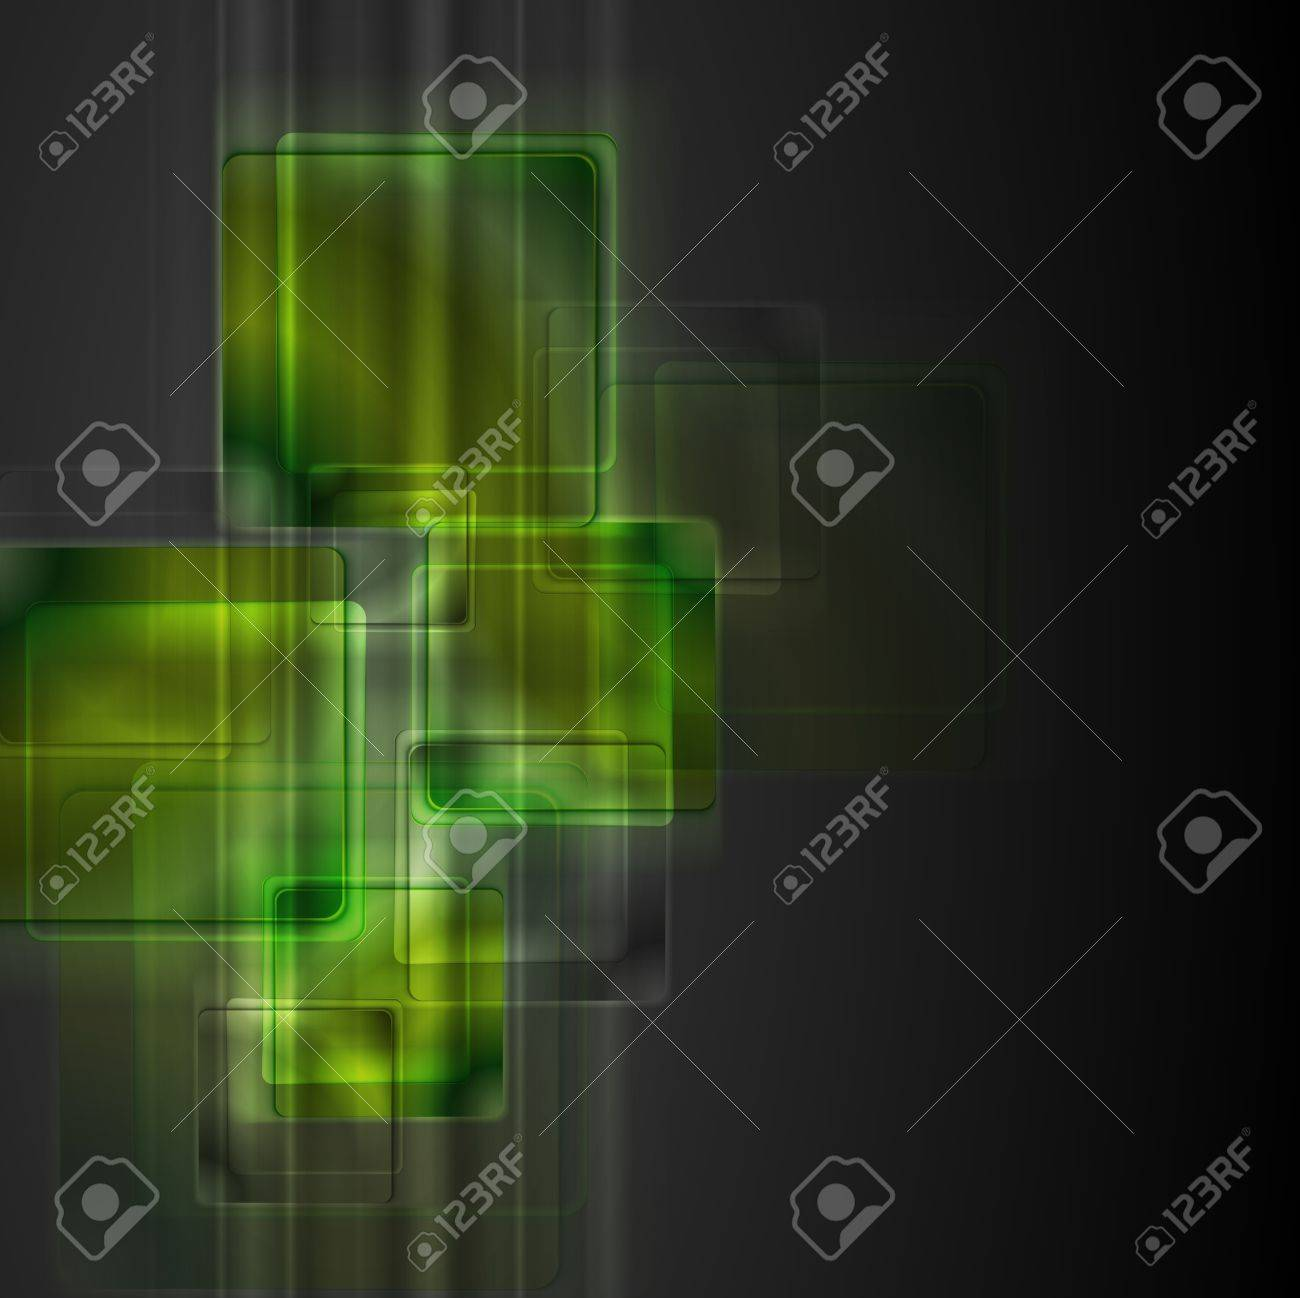 Dark abstract technology design. Vector background eps 10 Stock Vector - 17386294